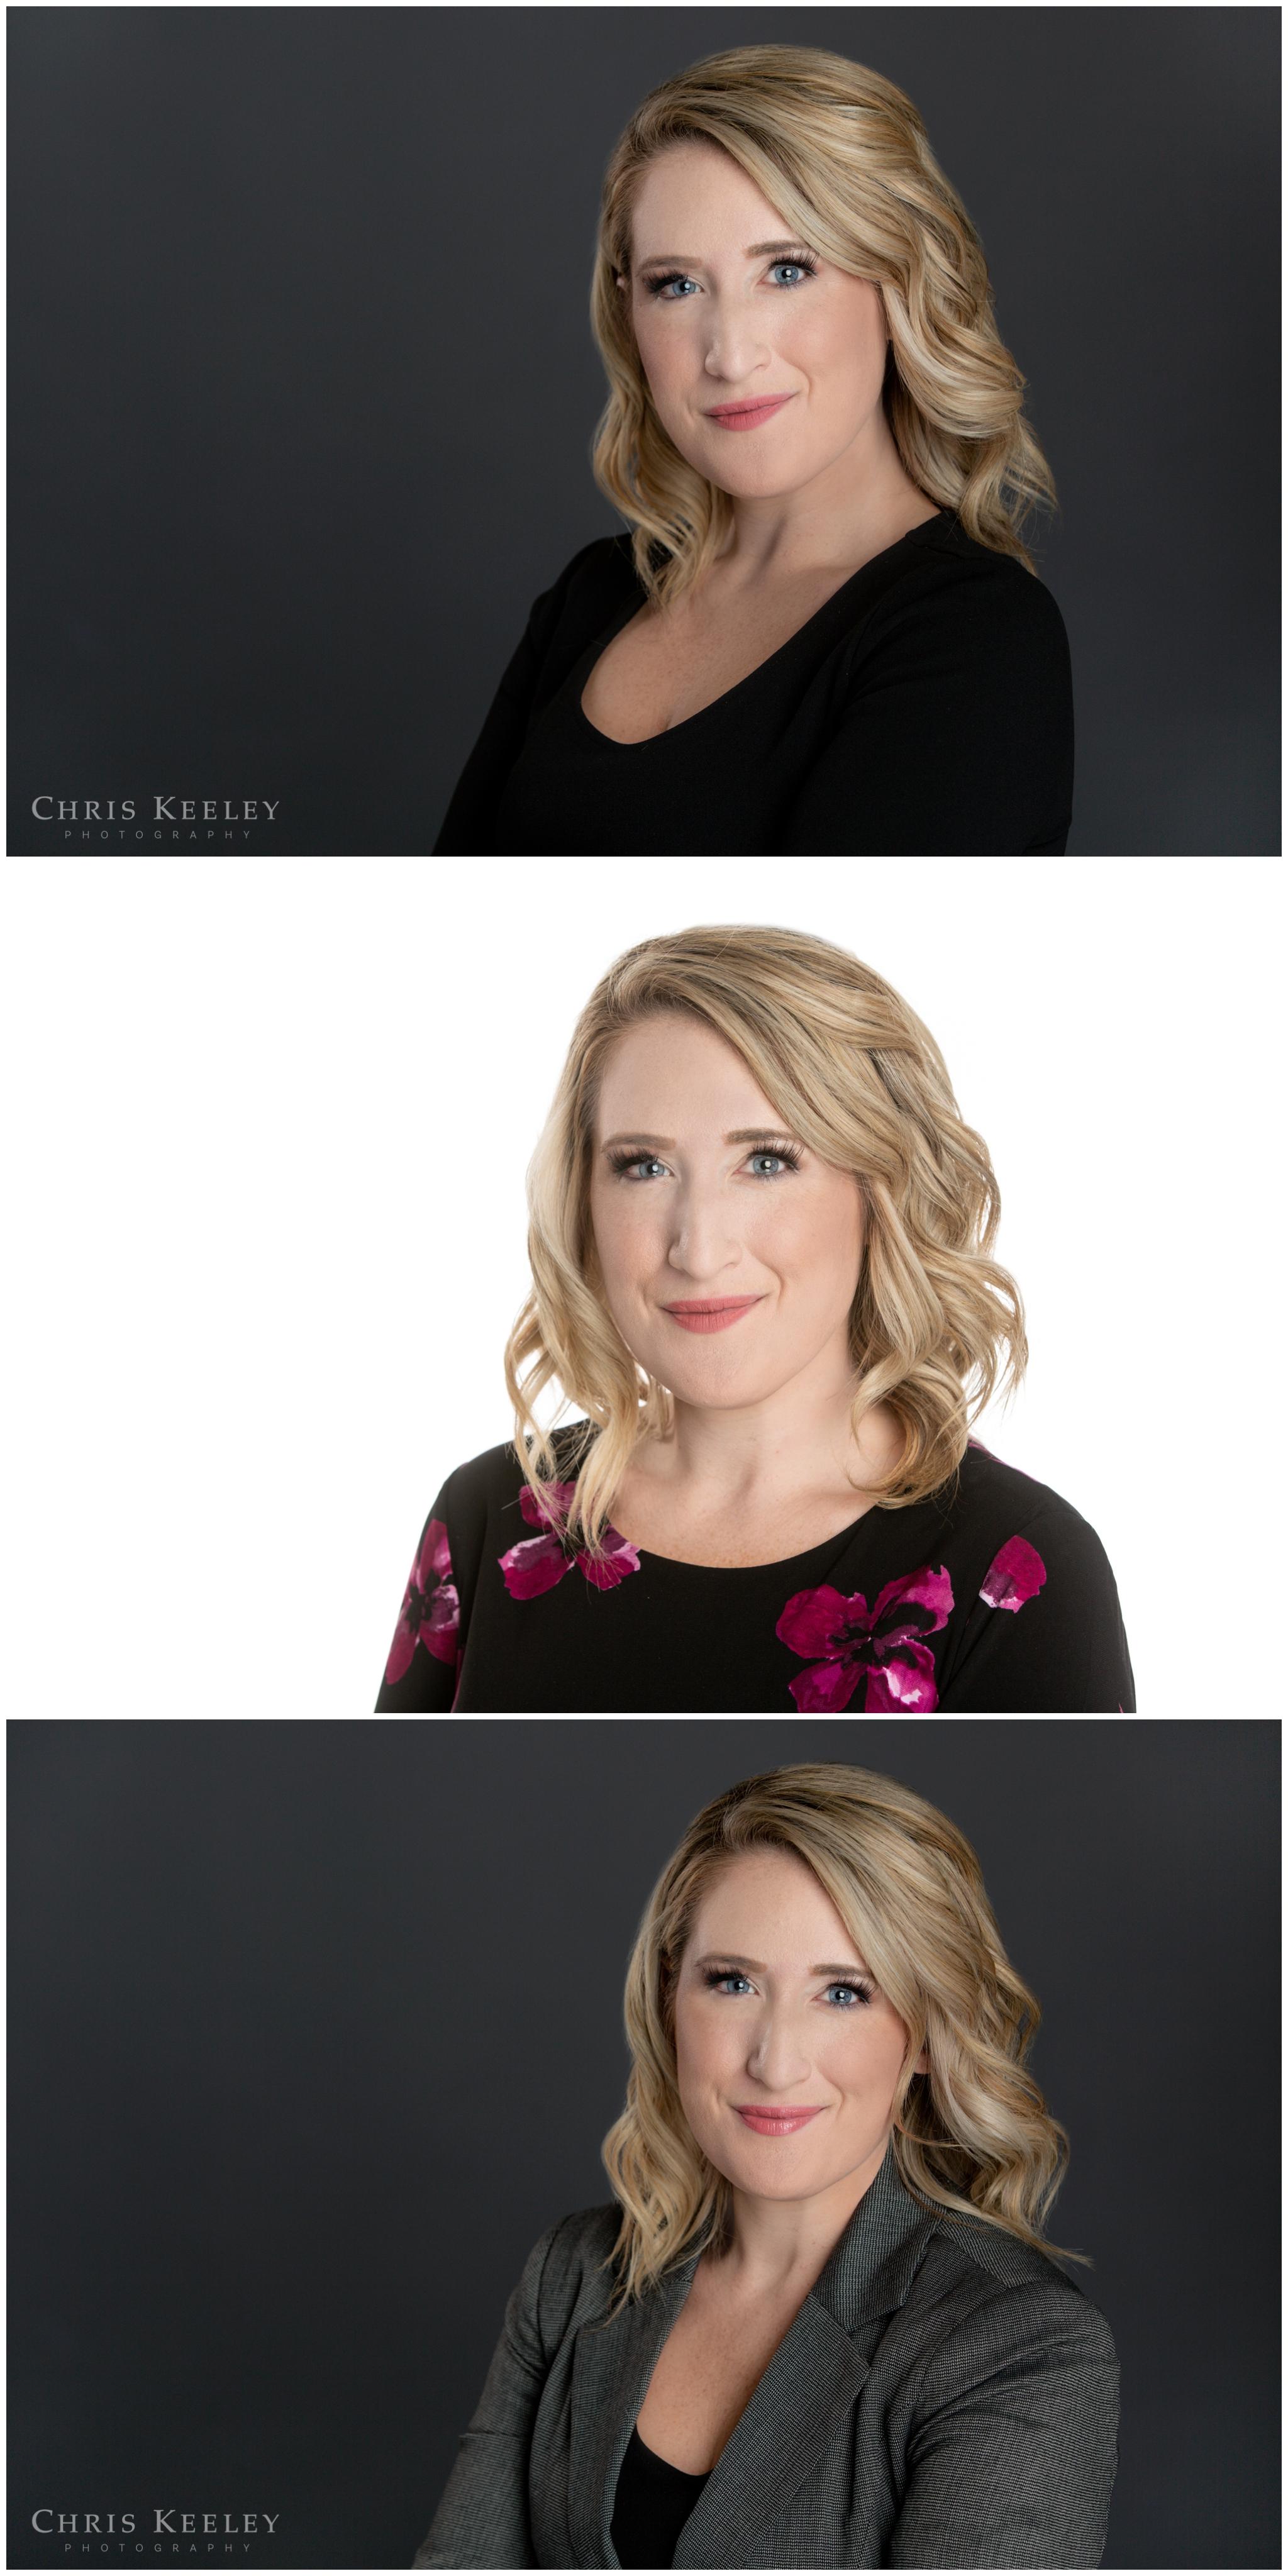 professional-headshots-new-hampshire-photographer-studio-04.jpg